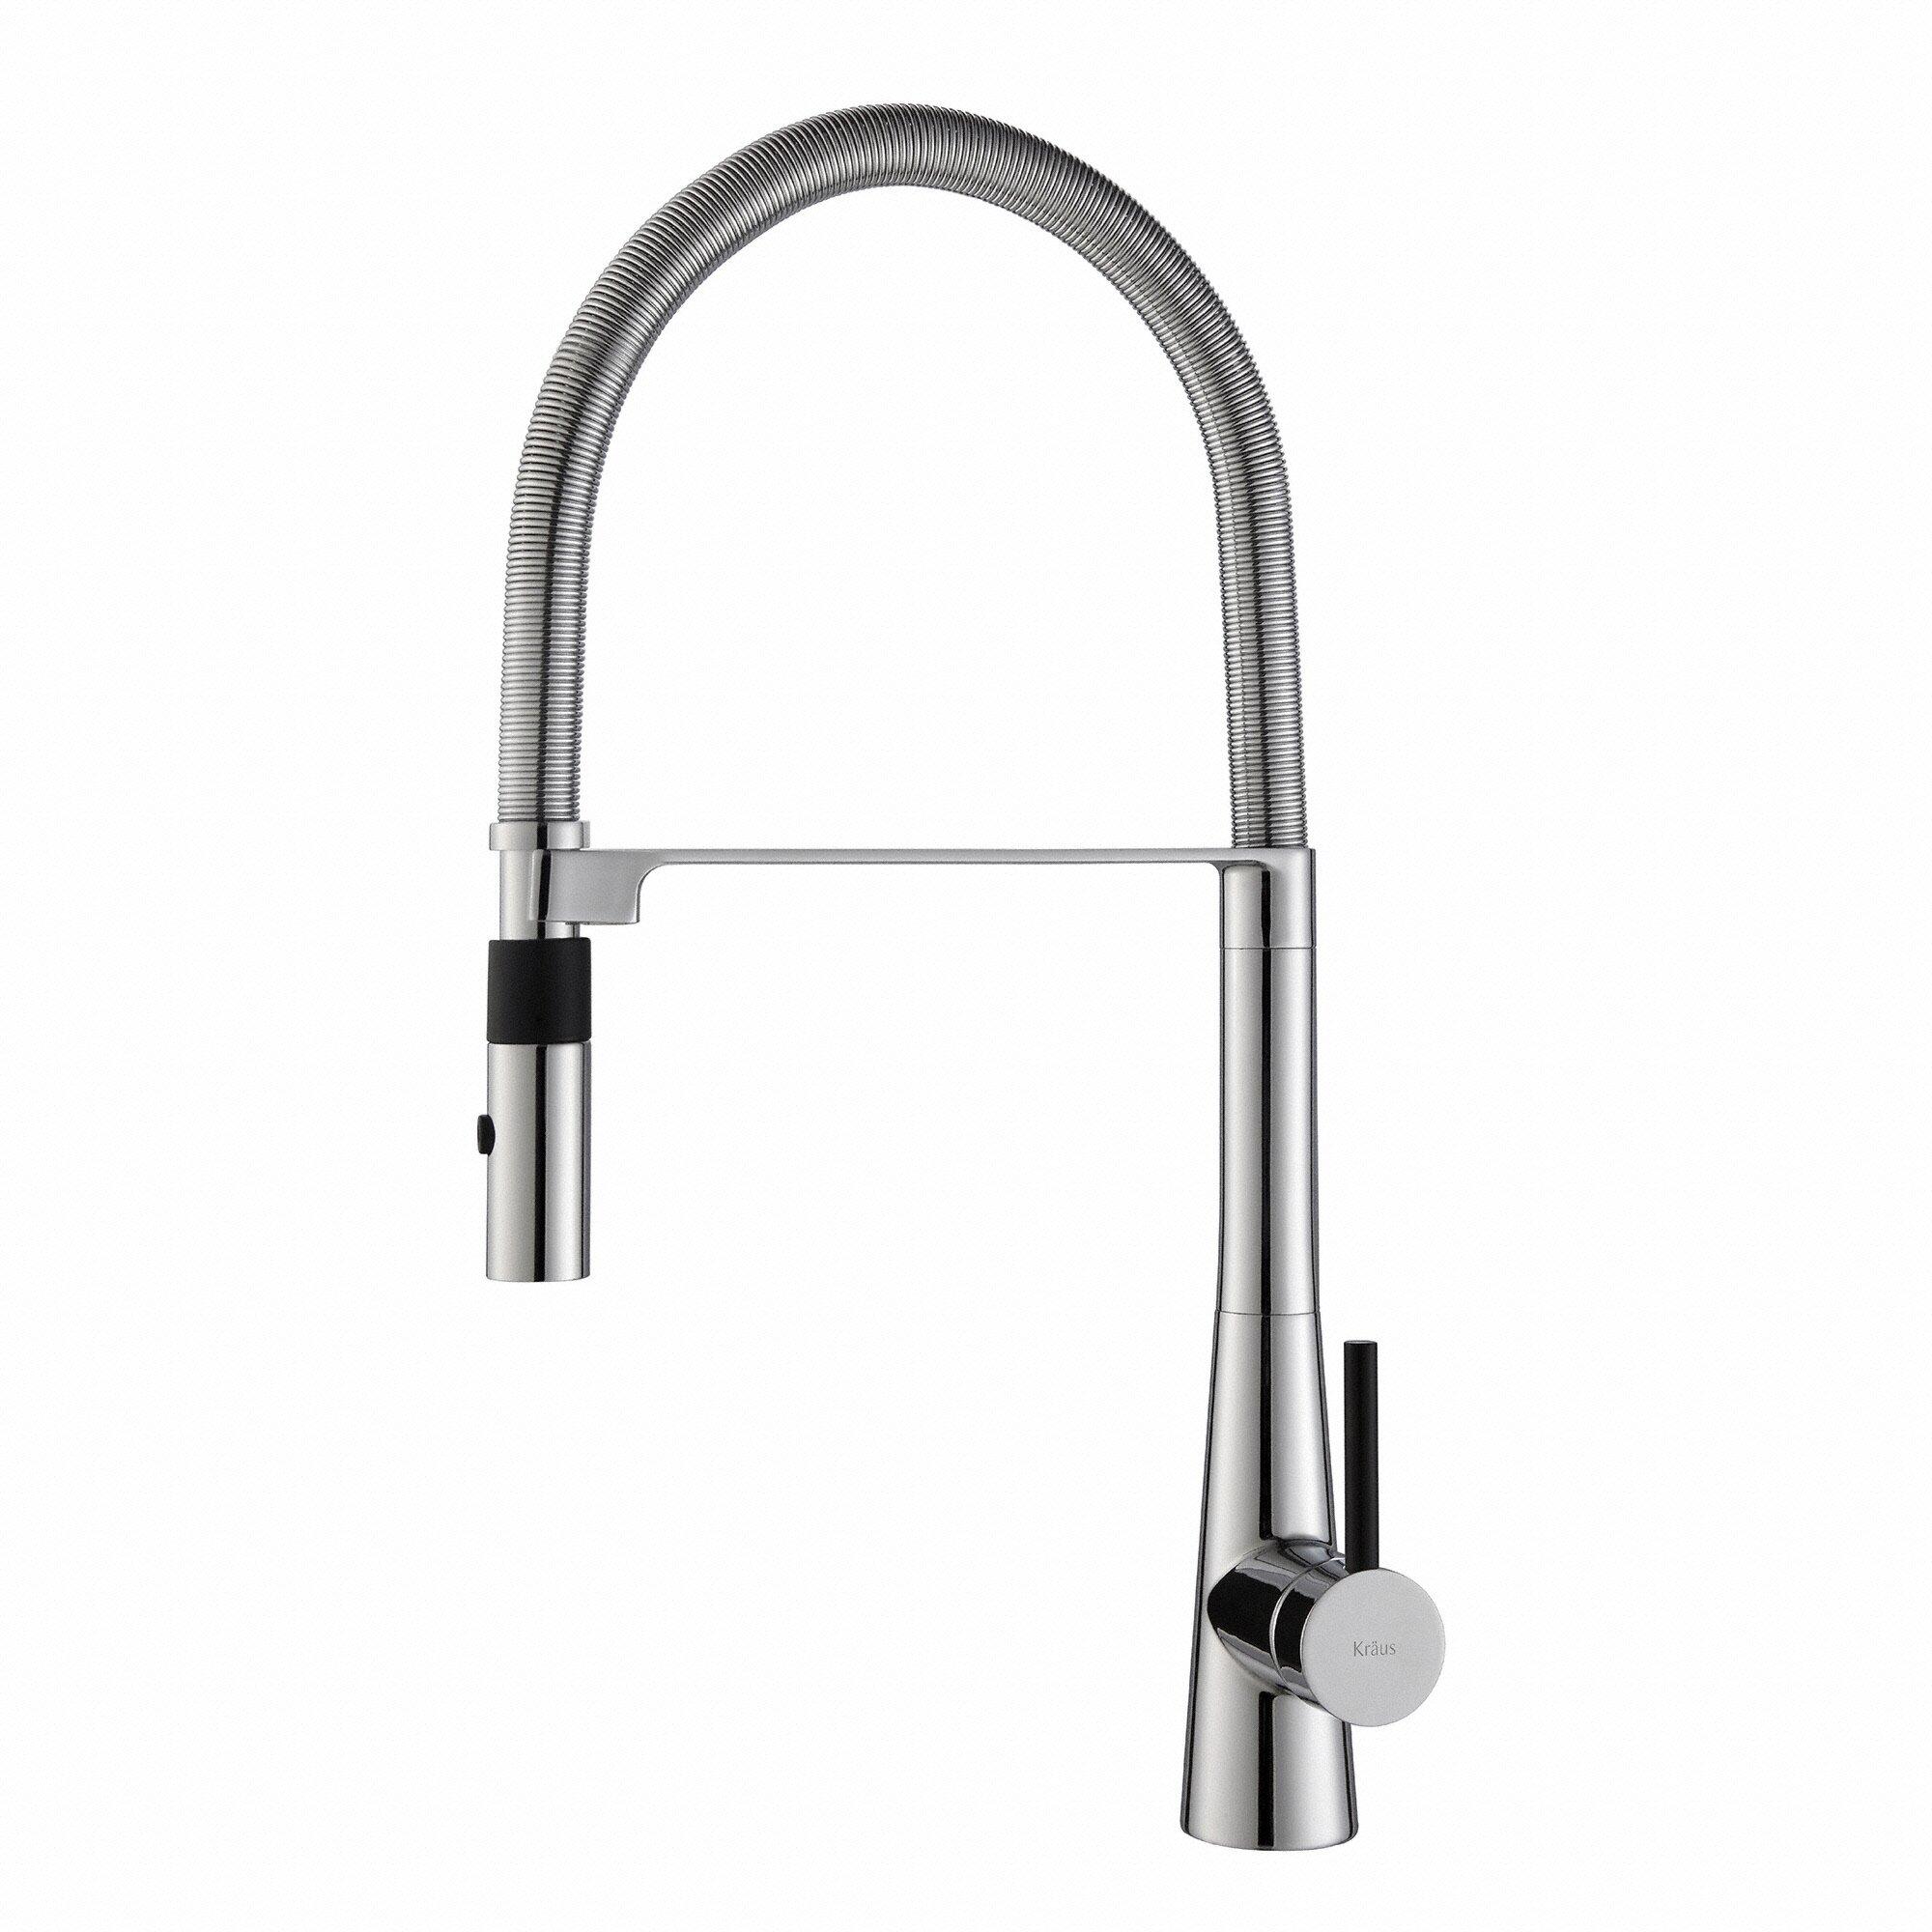 Kraus Crespo Single Lever Commercial Style Kitchen Faucet With Flex Hose Reviews